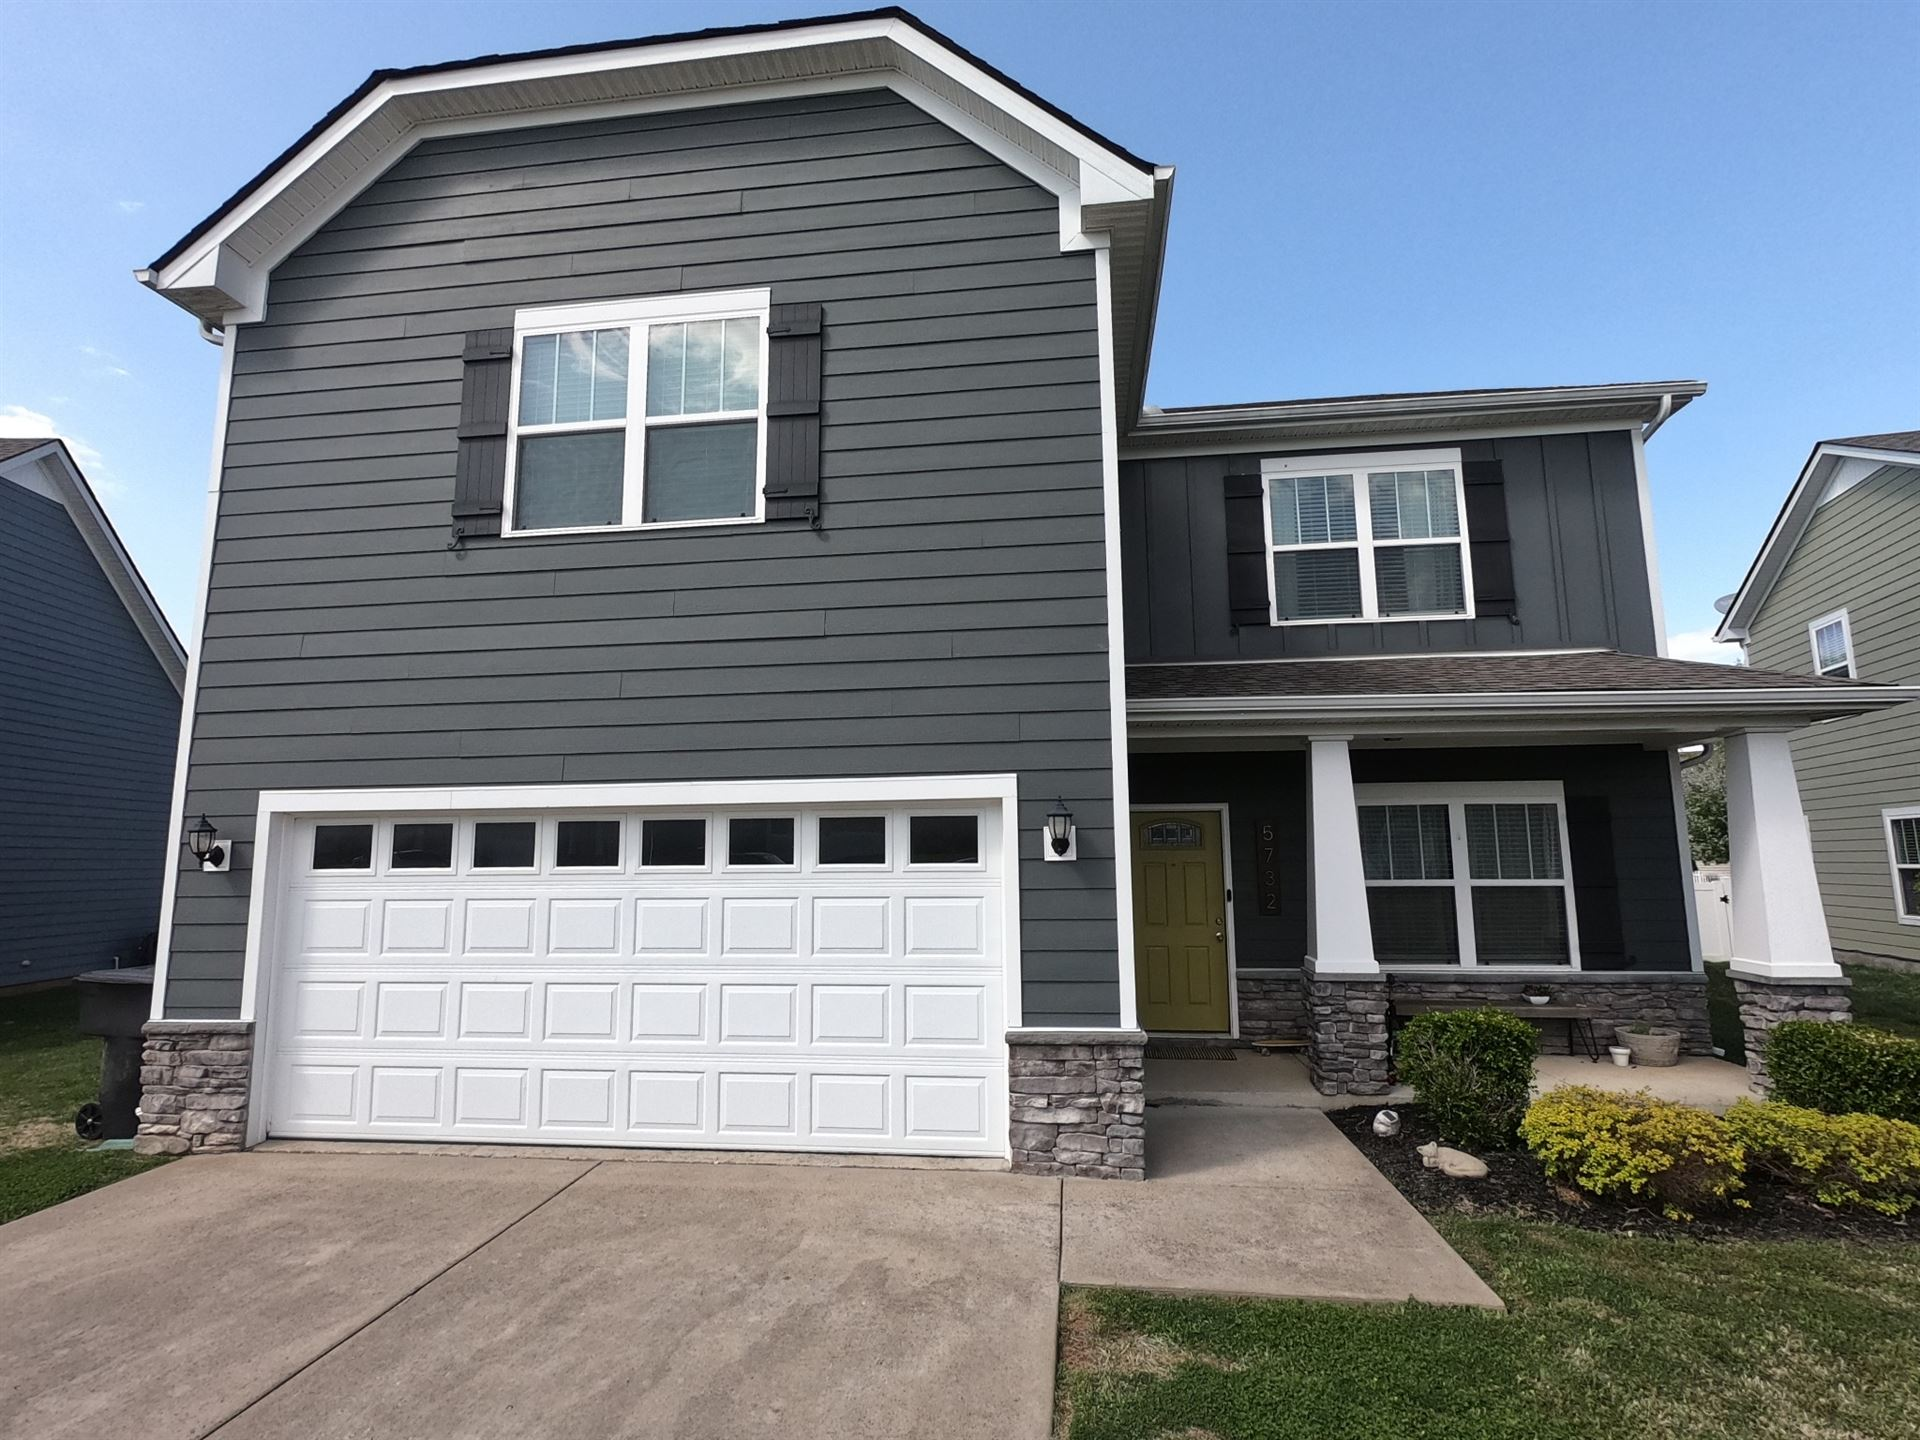 5732 Enclave Dr, Murfreesboro, TN 37128 - MLS#: 2243309